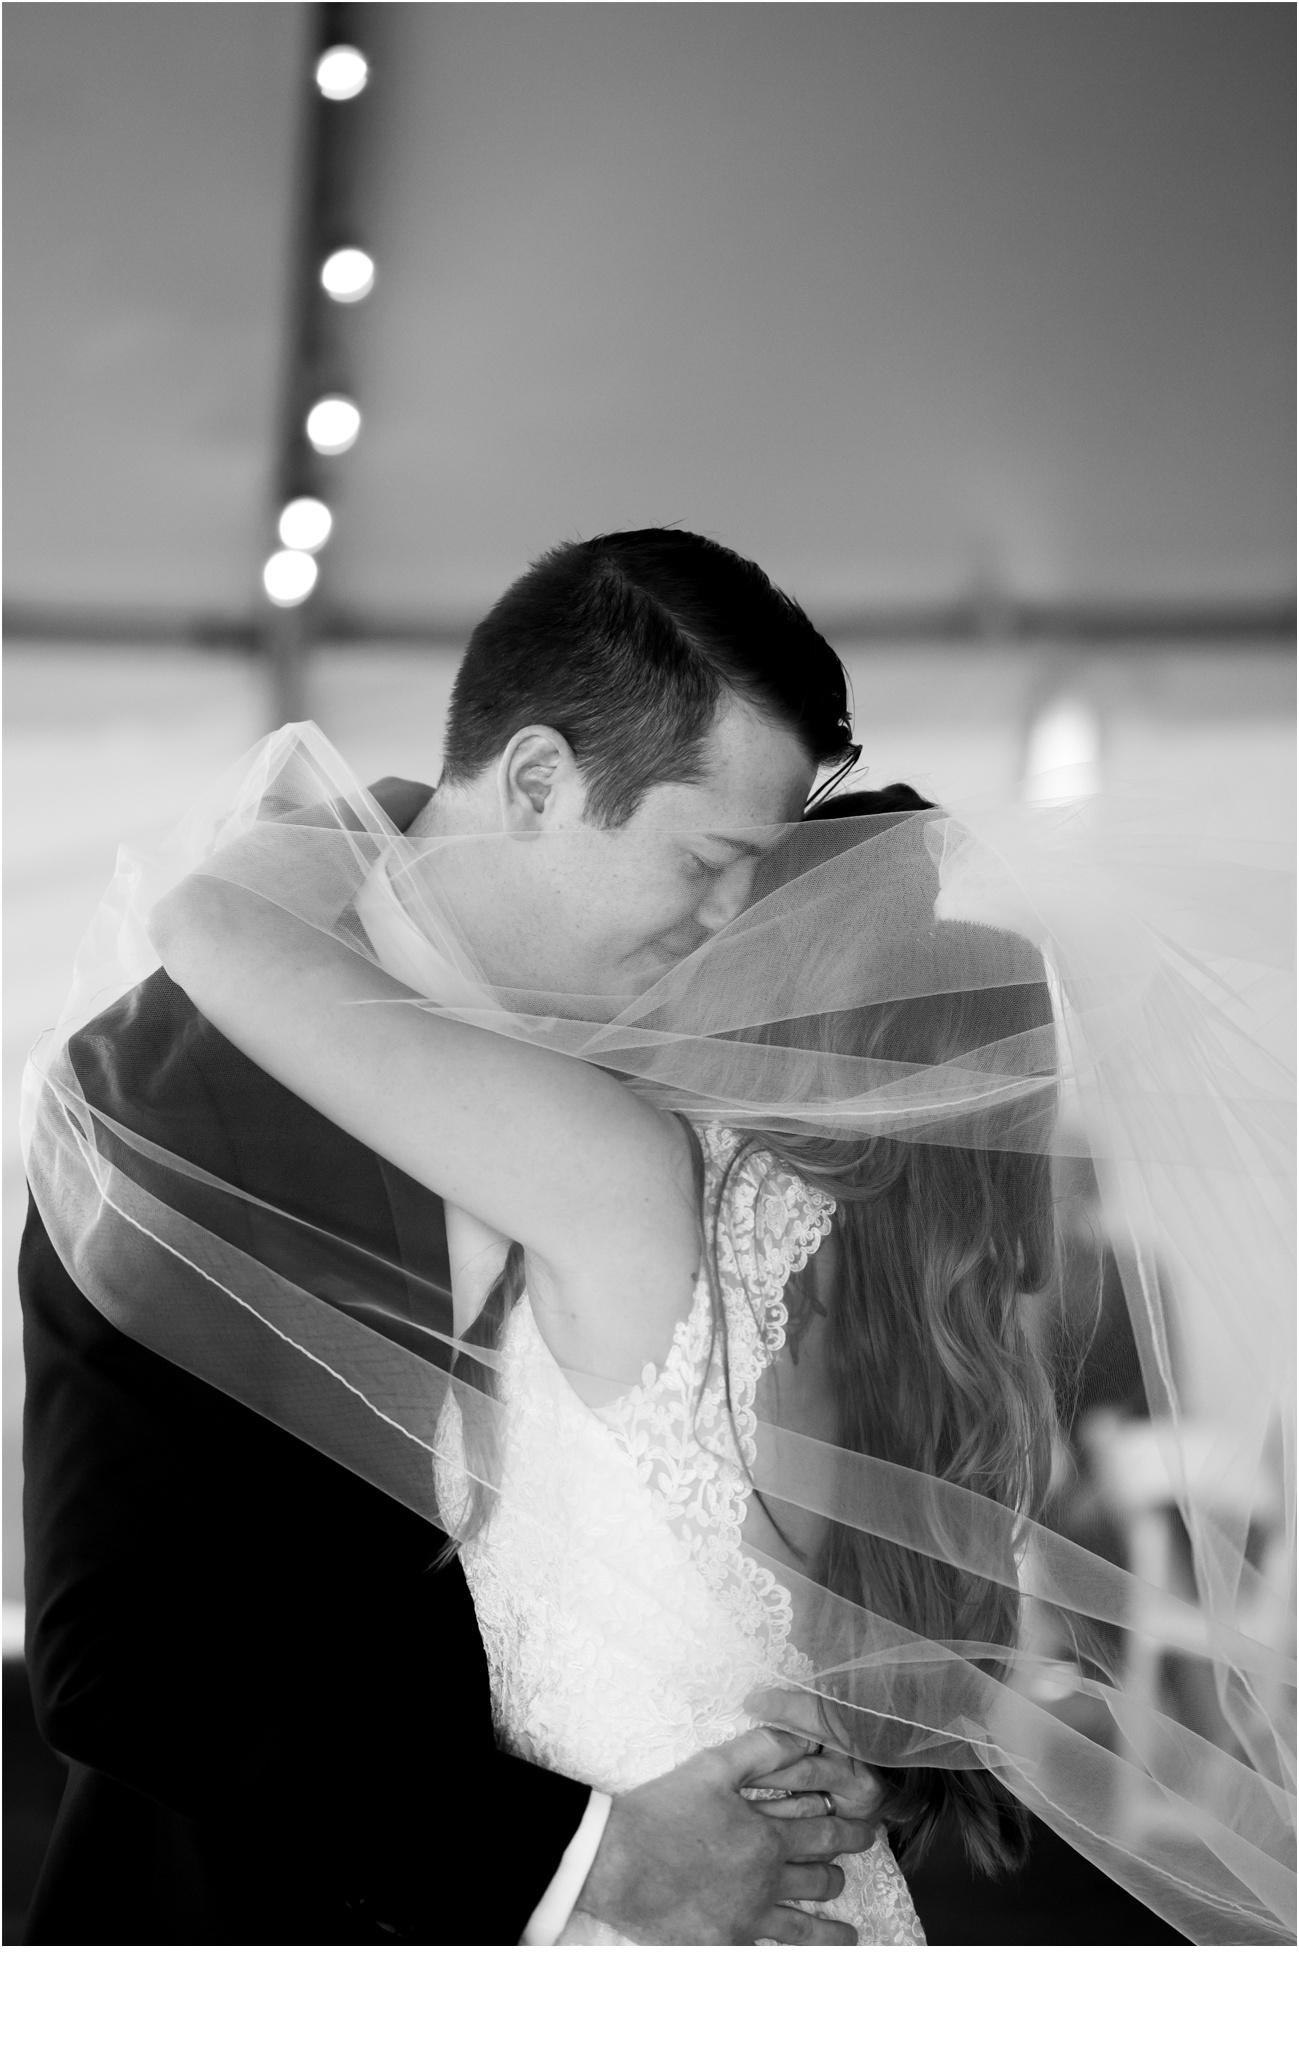 Rainey_Gregg_Photography_St._Simons_Island_Georgia_California_Wedding_Portrait_Photography_0880.jpg